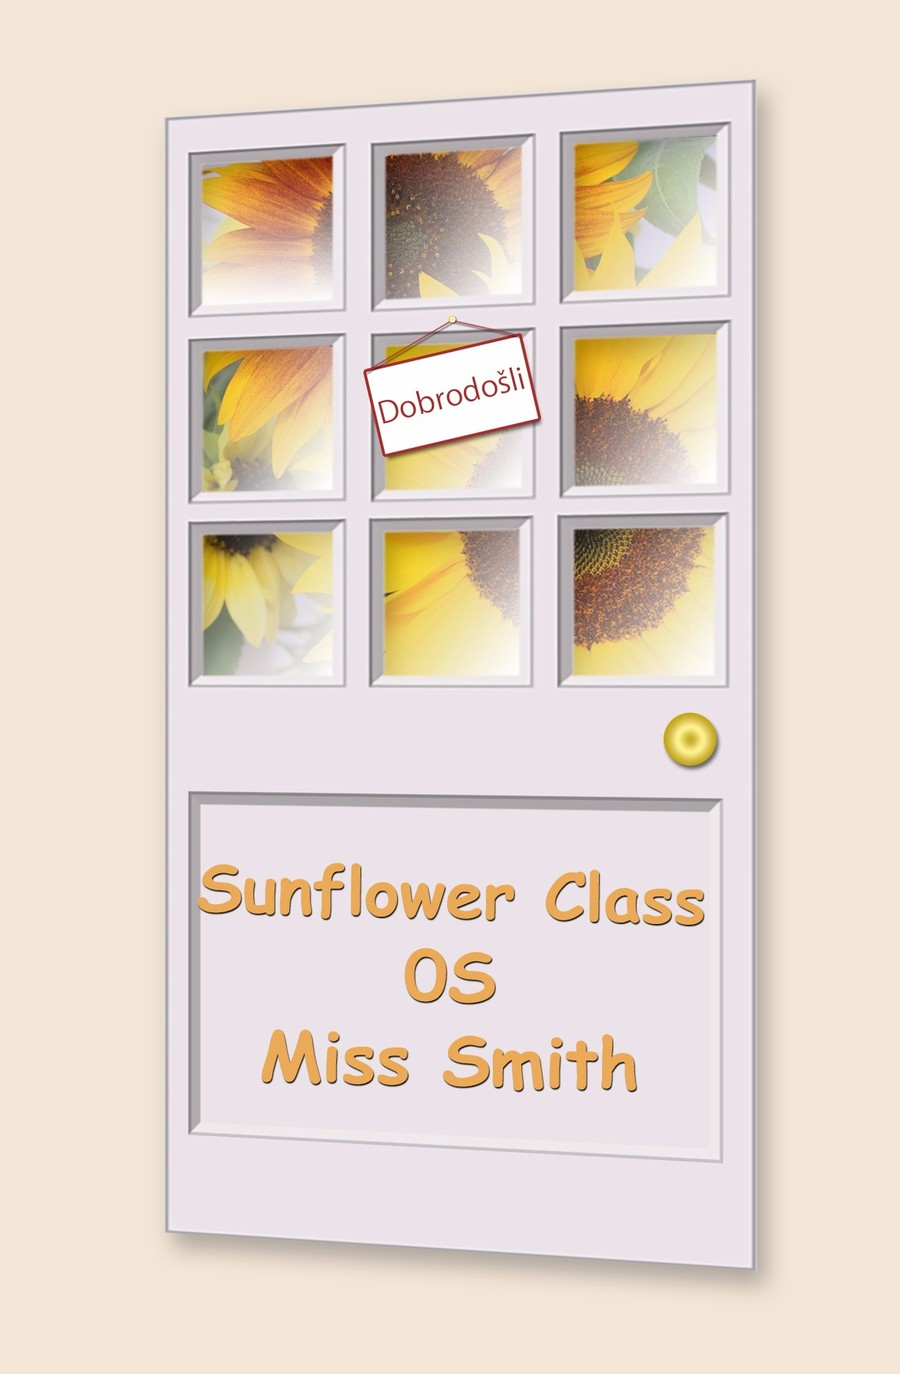 Go to Sunflower Class